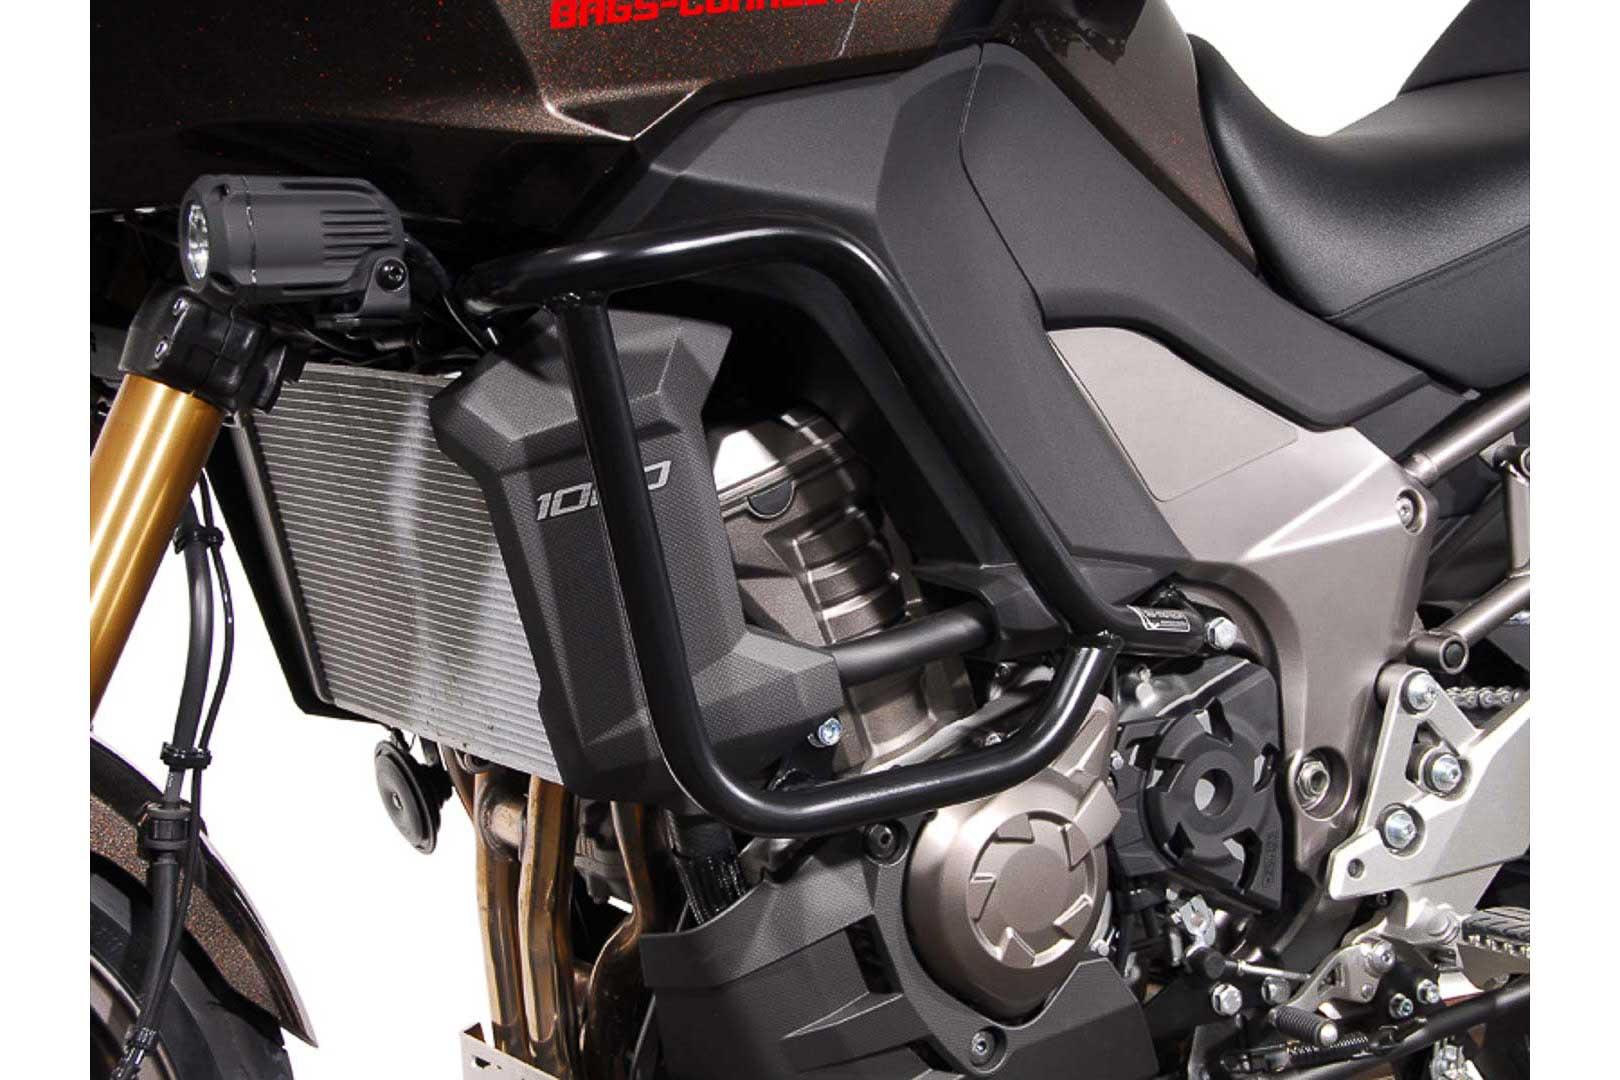 SW-Motech Moottorinsuojarauta Kawasaki Versys 1000